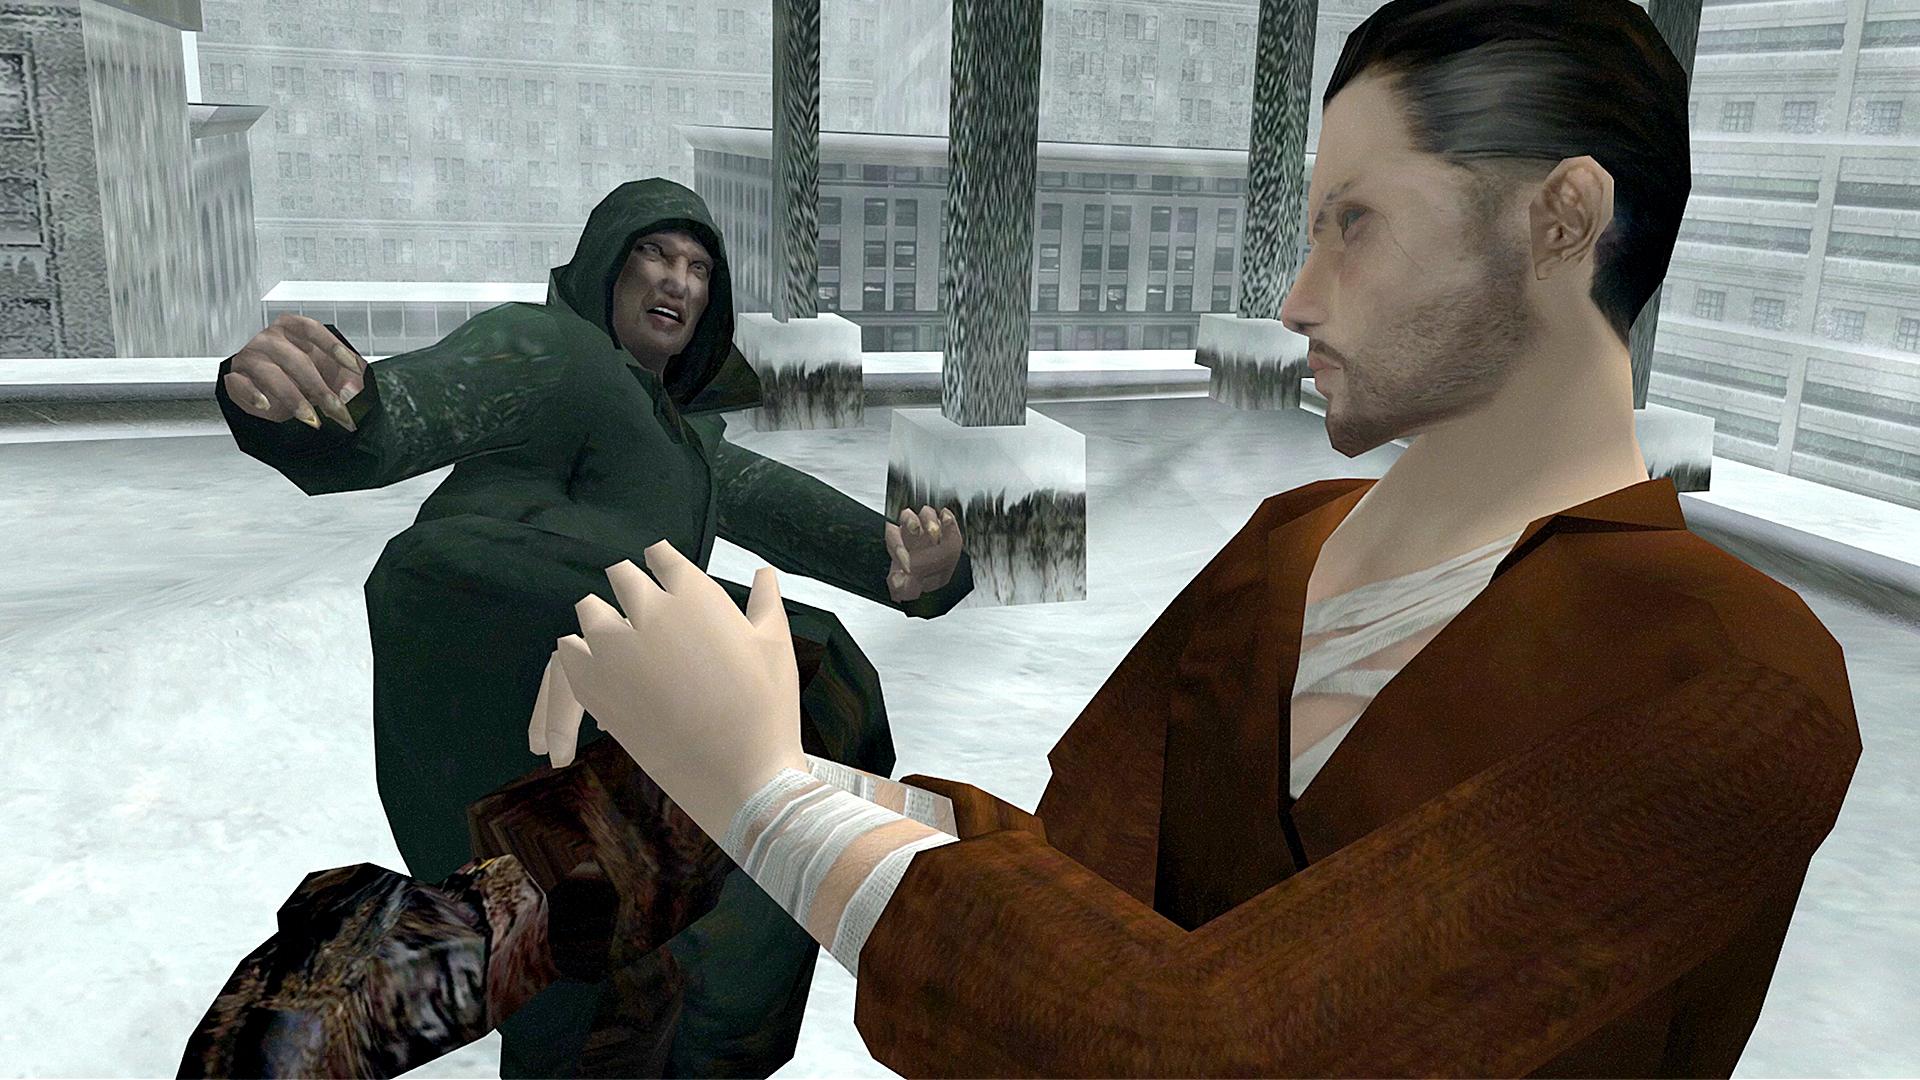 Fahrenheit Indigo Prophecy Remastered ESPAÑOL PC Full (CODEX) 9